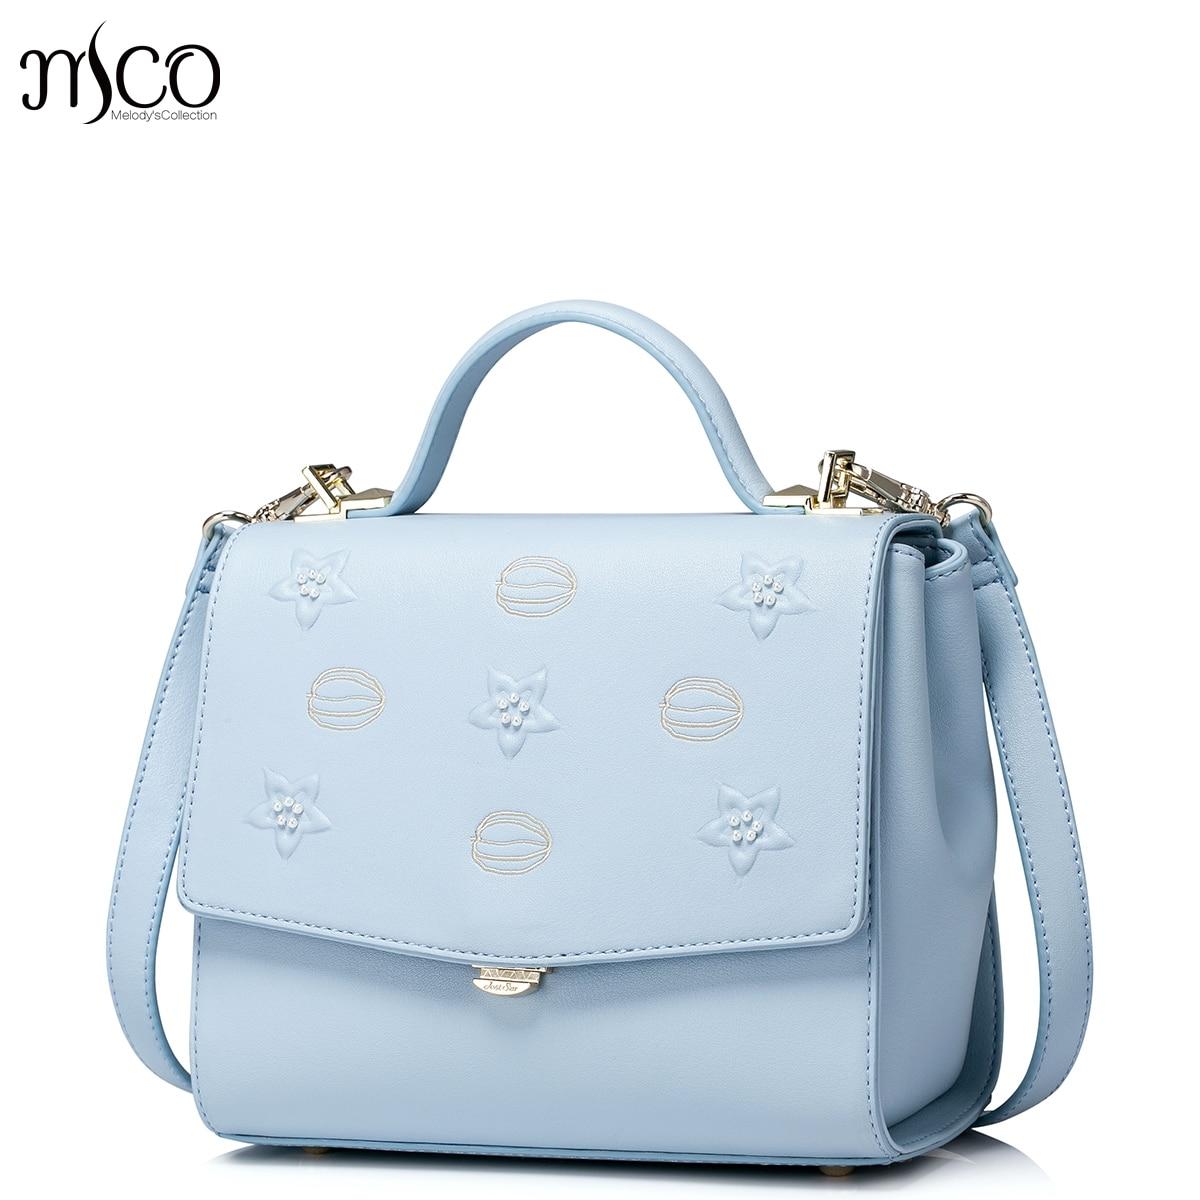 2017 New Fashion Stars Printing Fresh Blue Flap Handbag For OL Ladies Luxury Embroidery Women Shoulder Bag Small Messenger Bags стоимость